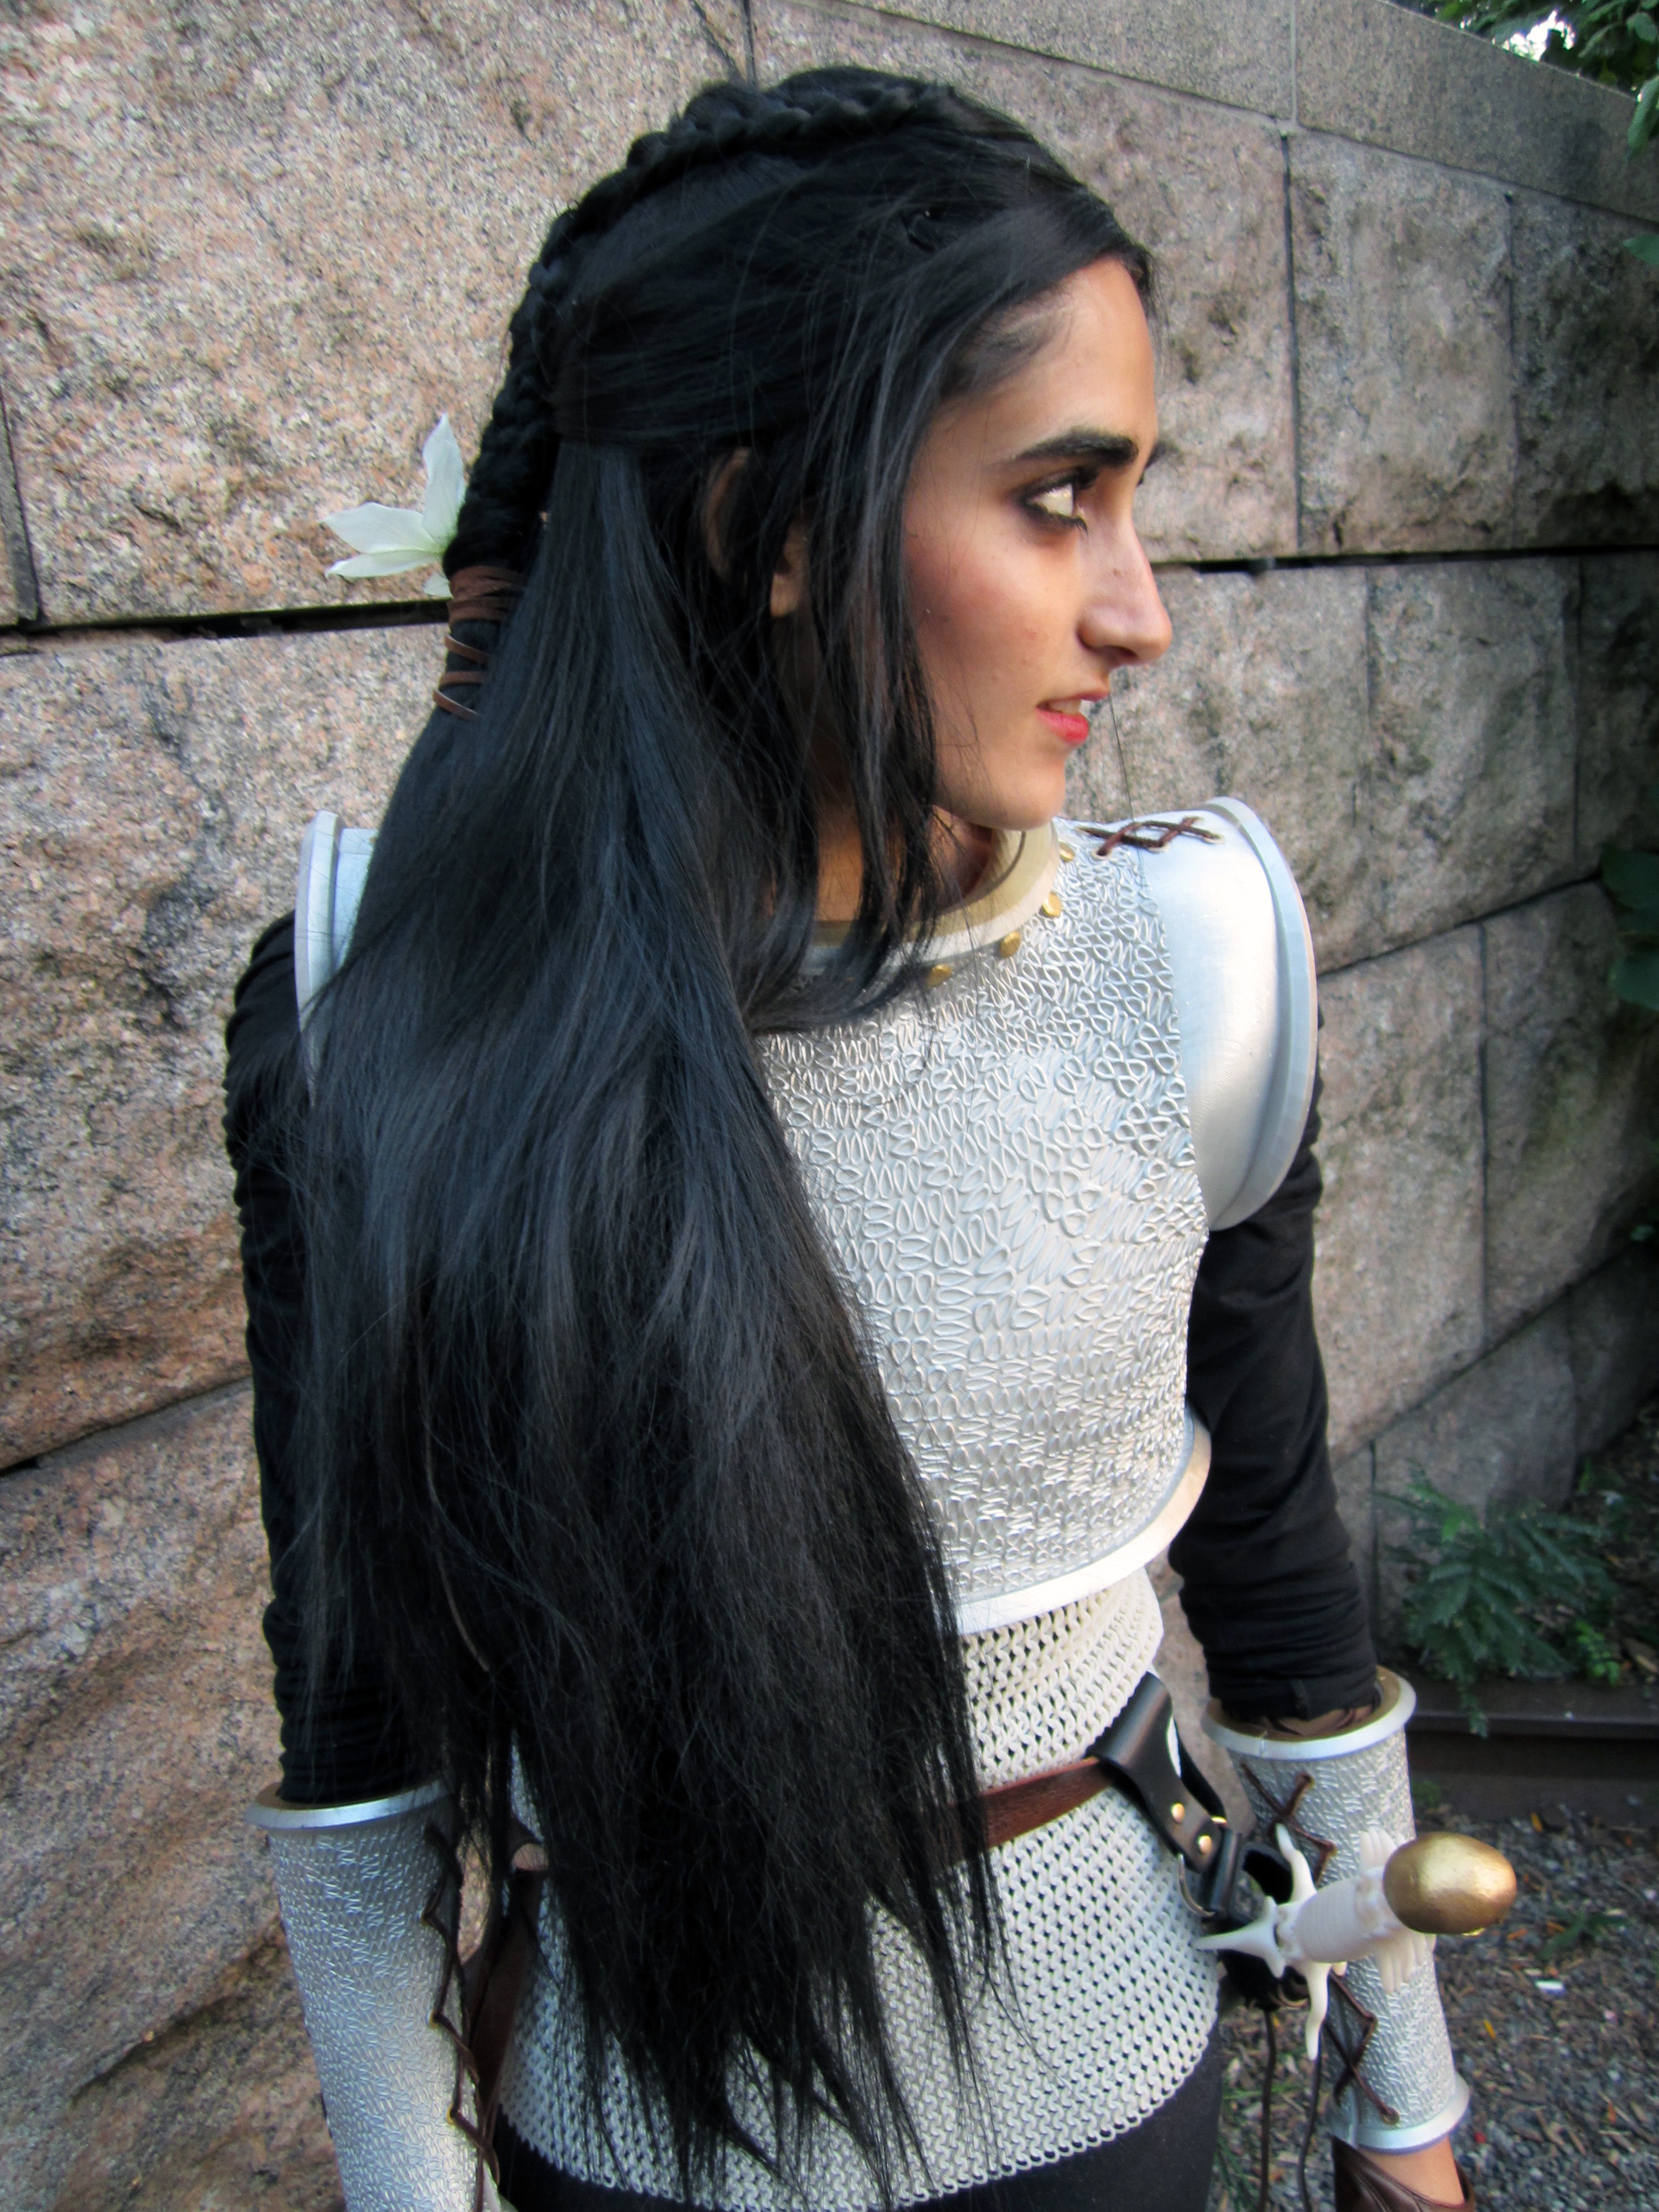 Queen Knight